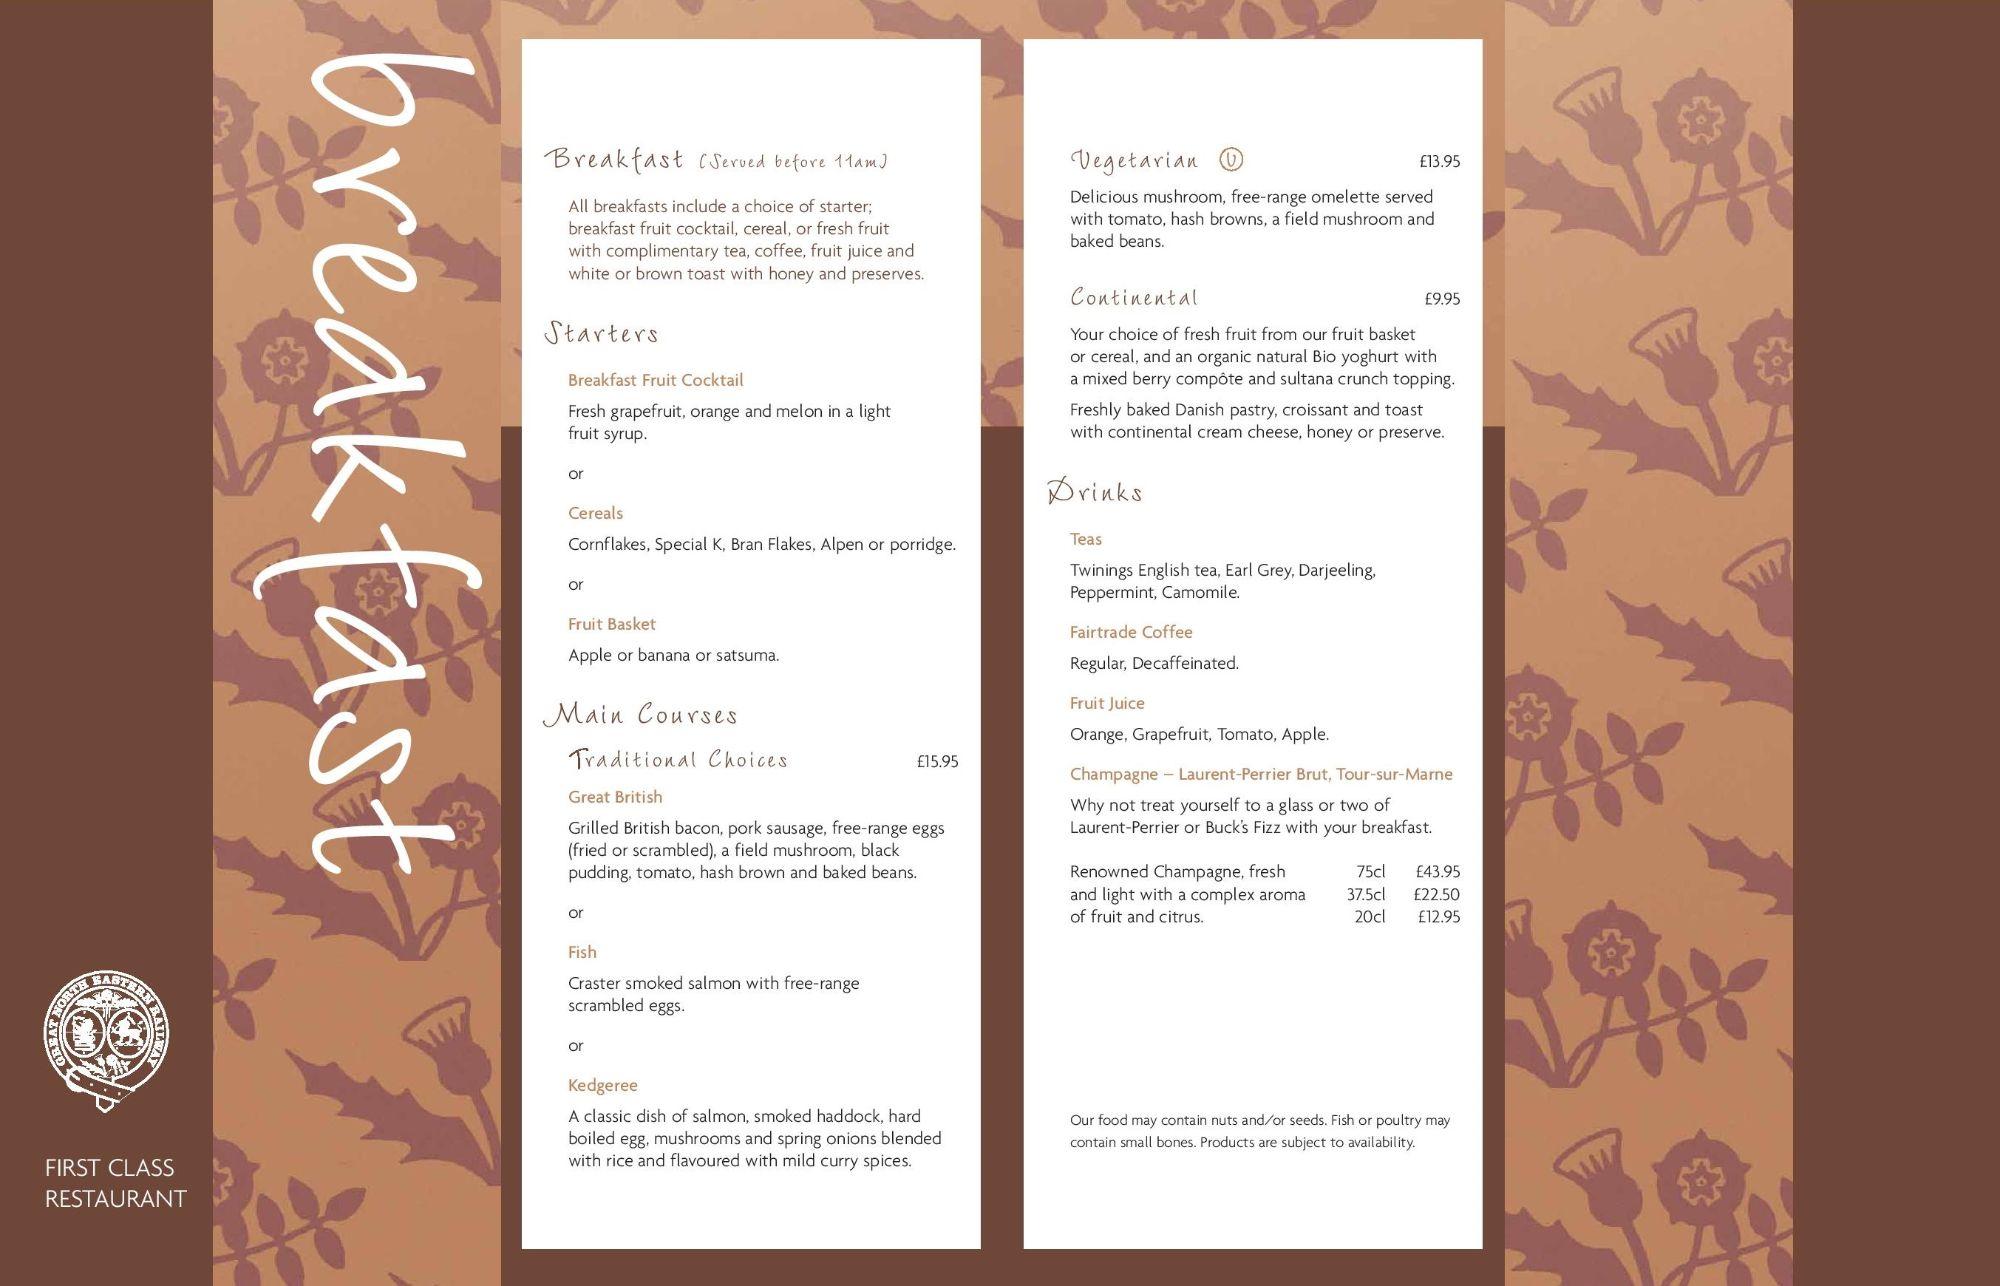 Image showing sample of the GNER breakfast menu circa 2007.